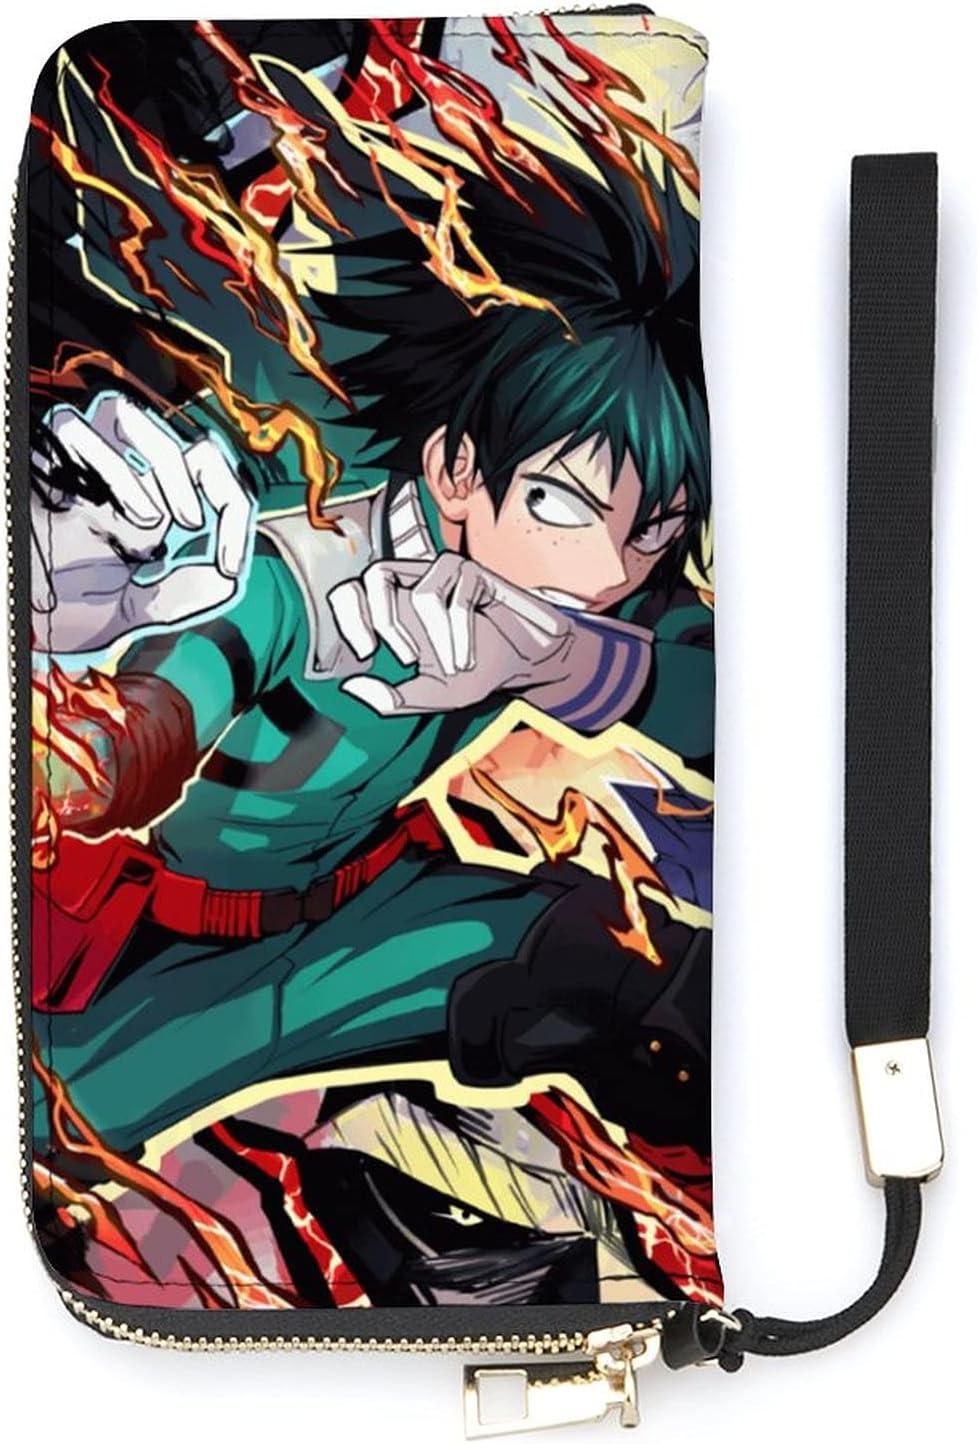 Izuku My Hero Academia Anime Wallet Seasonal Wrap Introduction Soft Max 68% OFF Pri PU Cartoon Leather